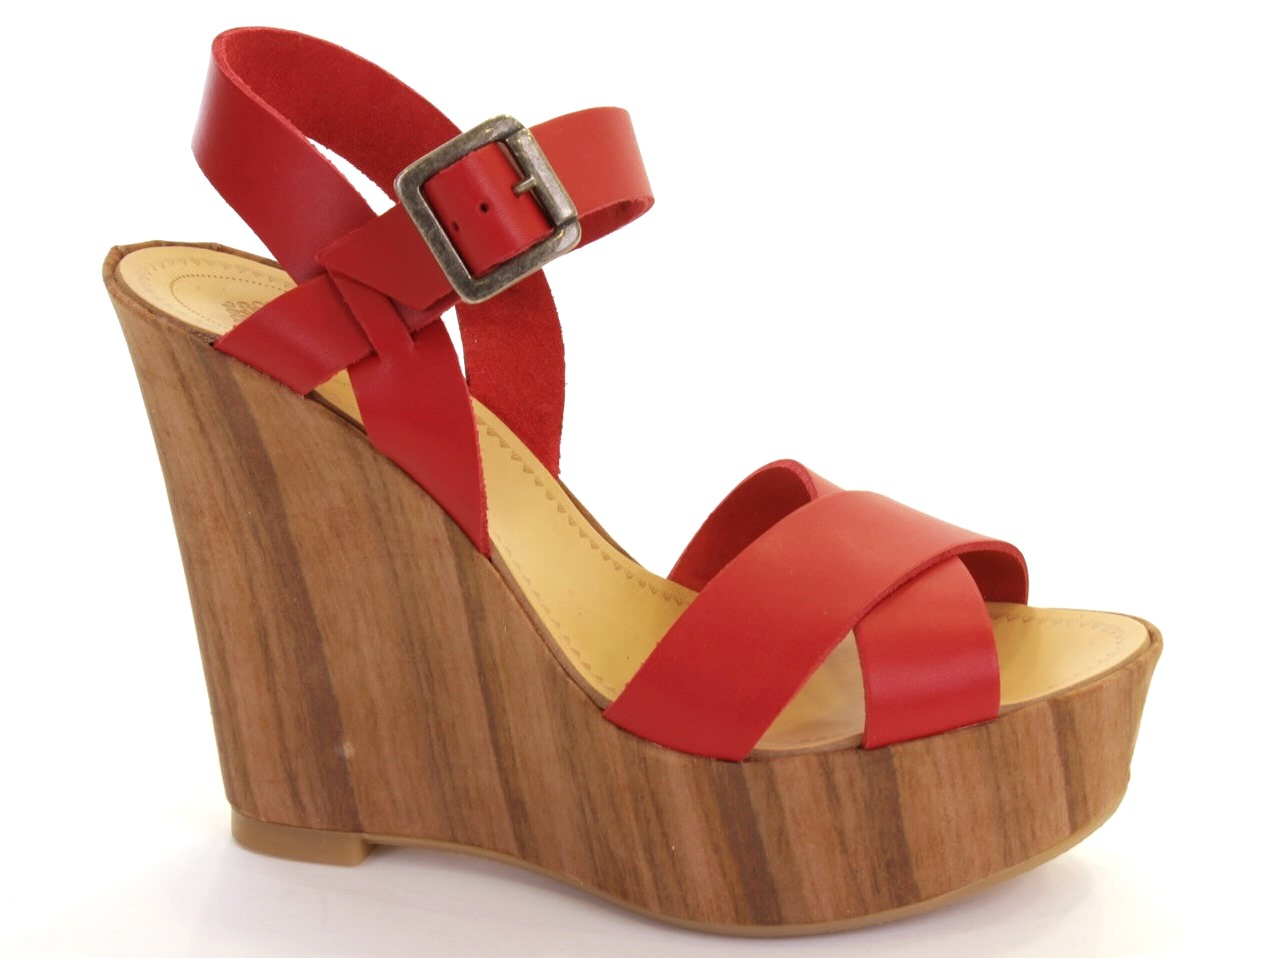 Wedge Sandals Fornarina - 642 8943